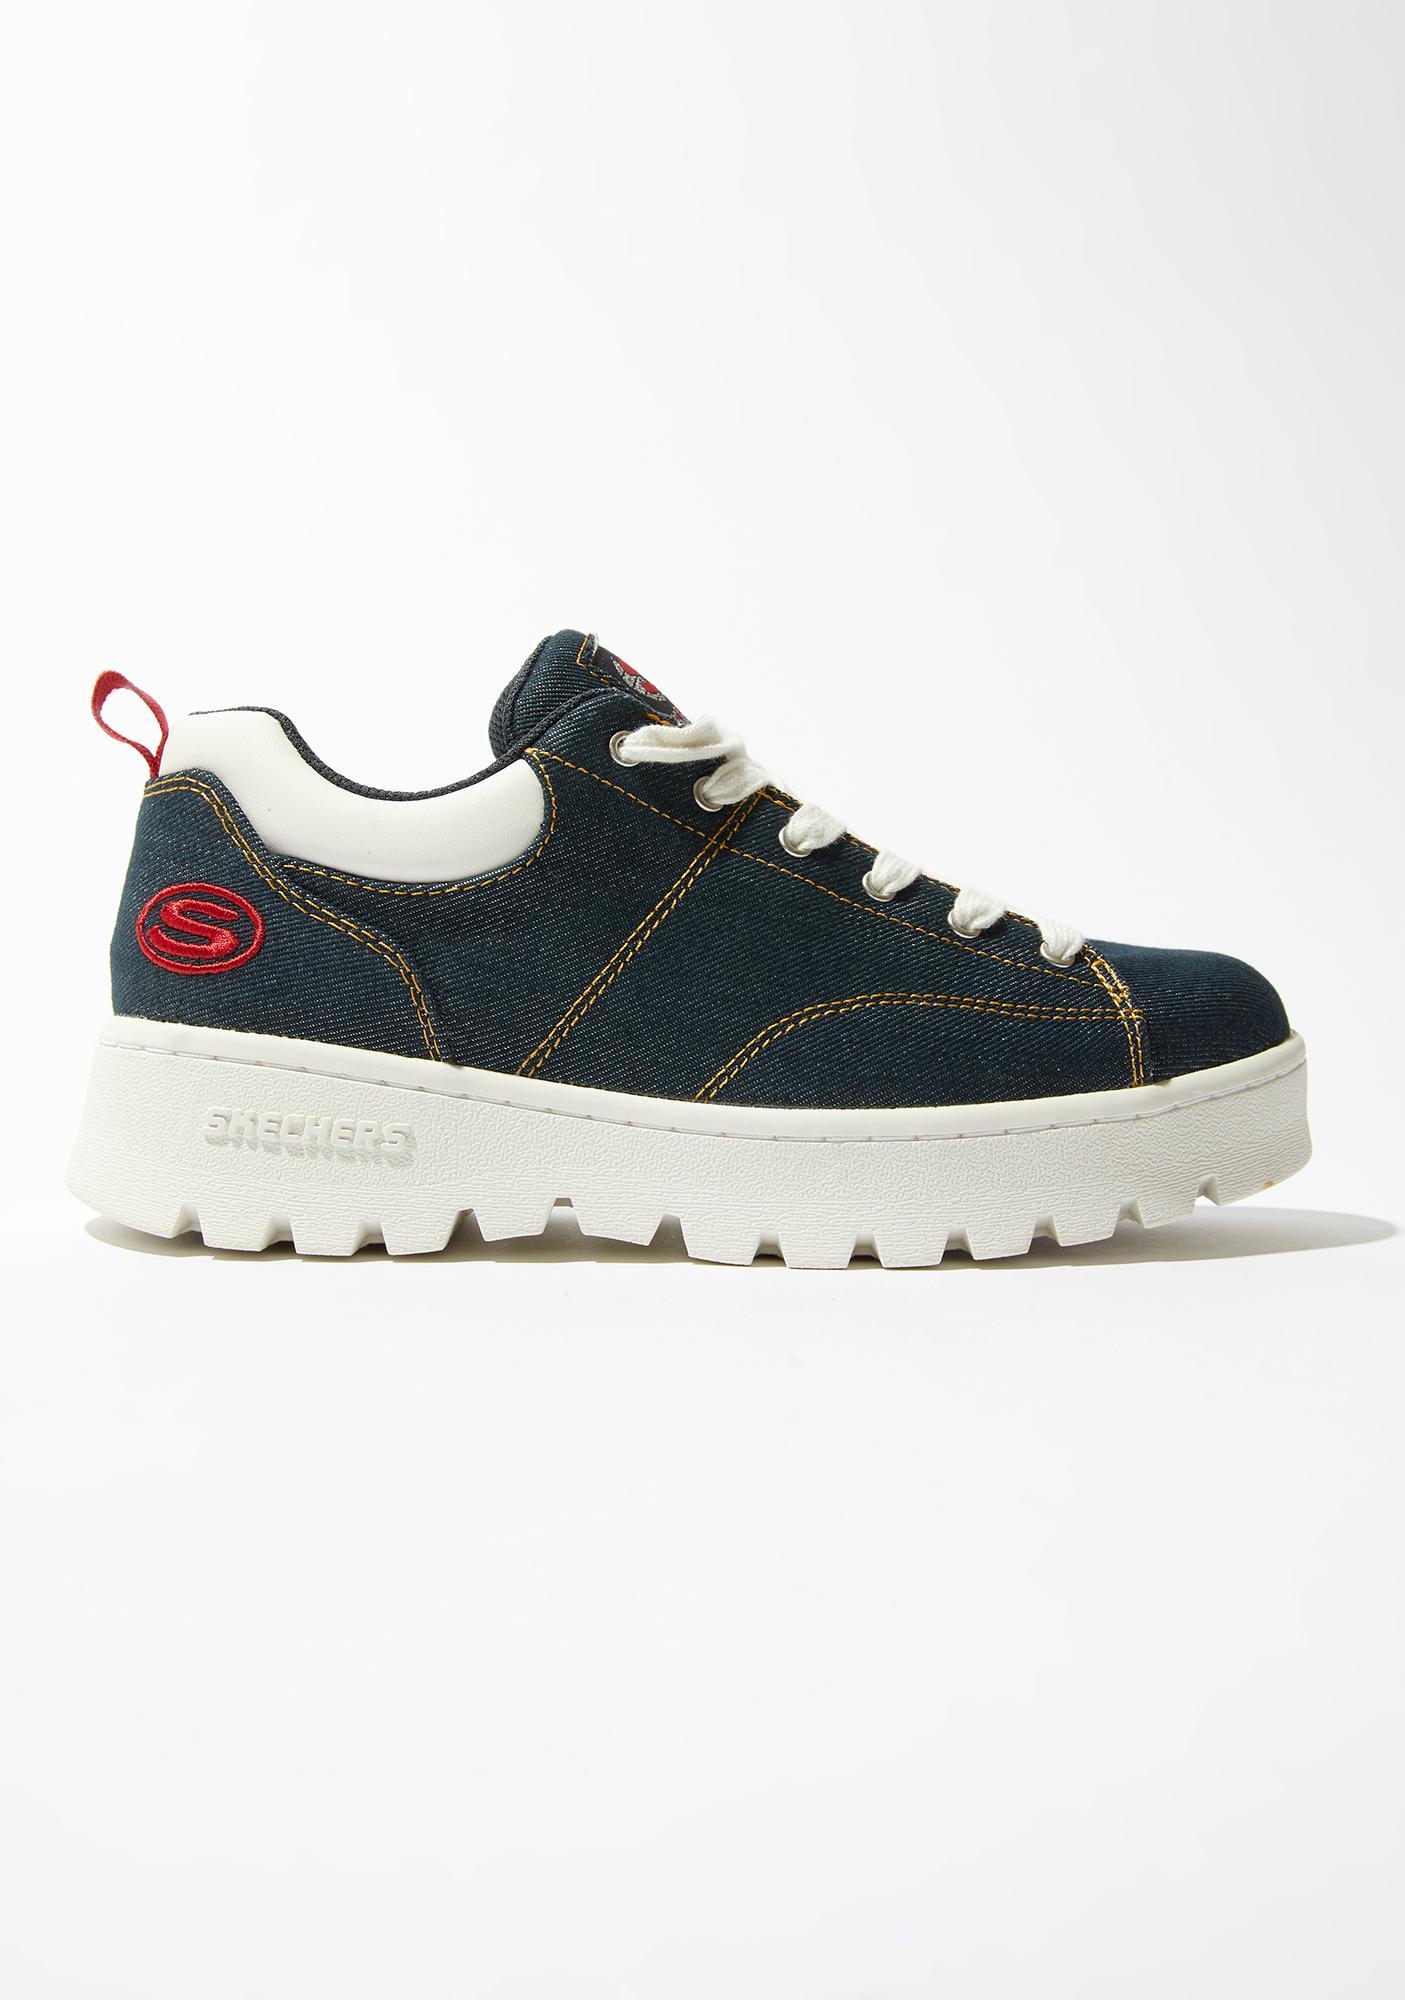 Skechers Urban Denim Cleats Sneakers